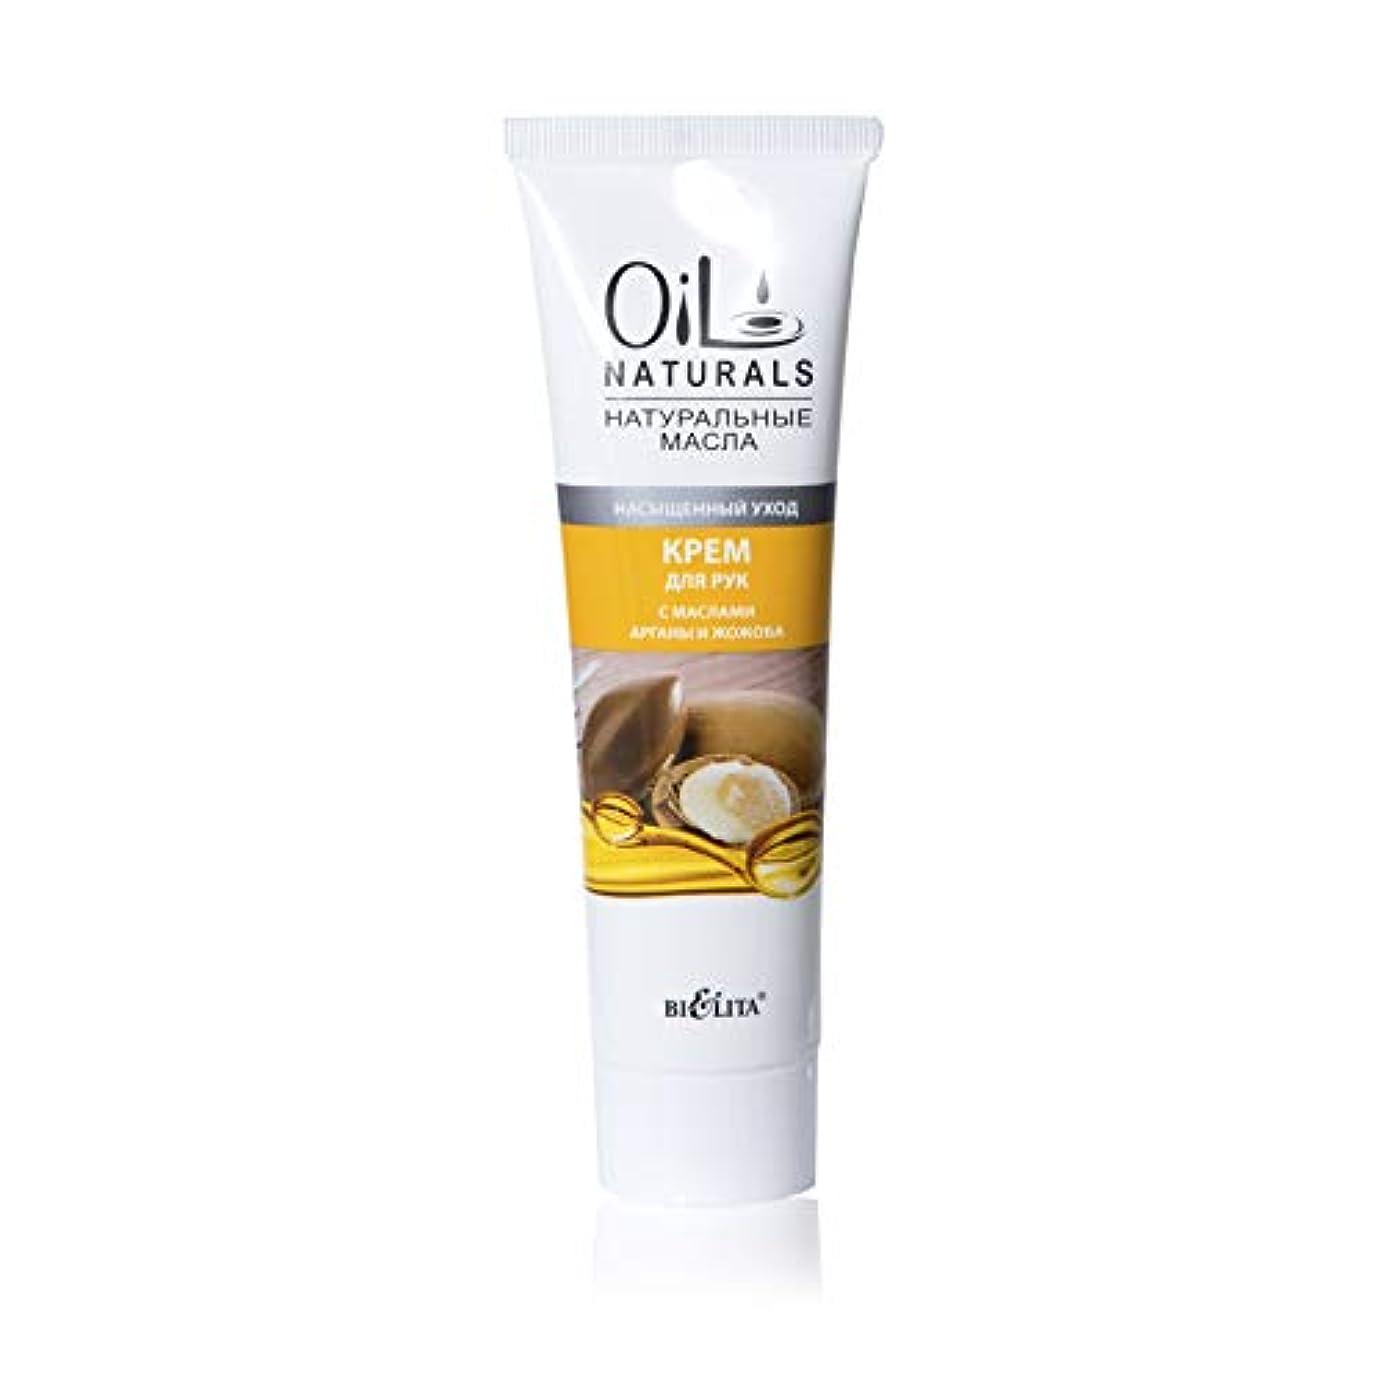 反論者不十分強風Bielita & Vitex Oil Naturals Line | Saturate Care Hand Cream, 100 ml | Argan Oil, Silk Proteins, Jojoba Oil, Vitamins